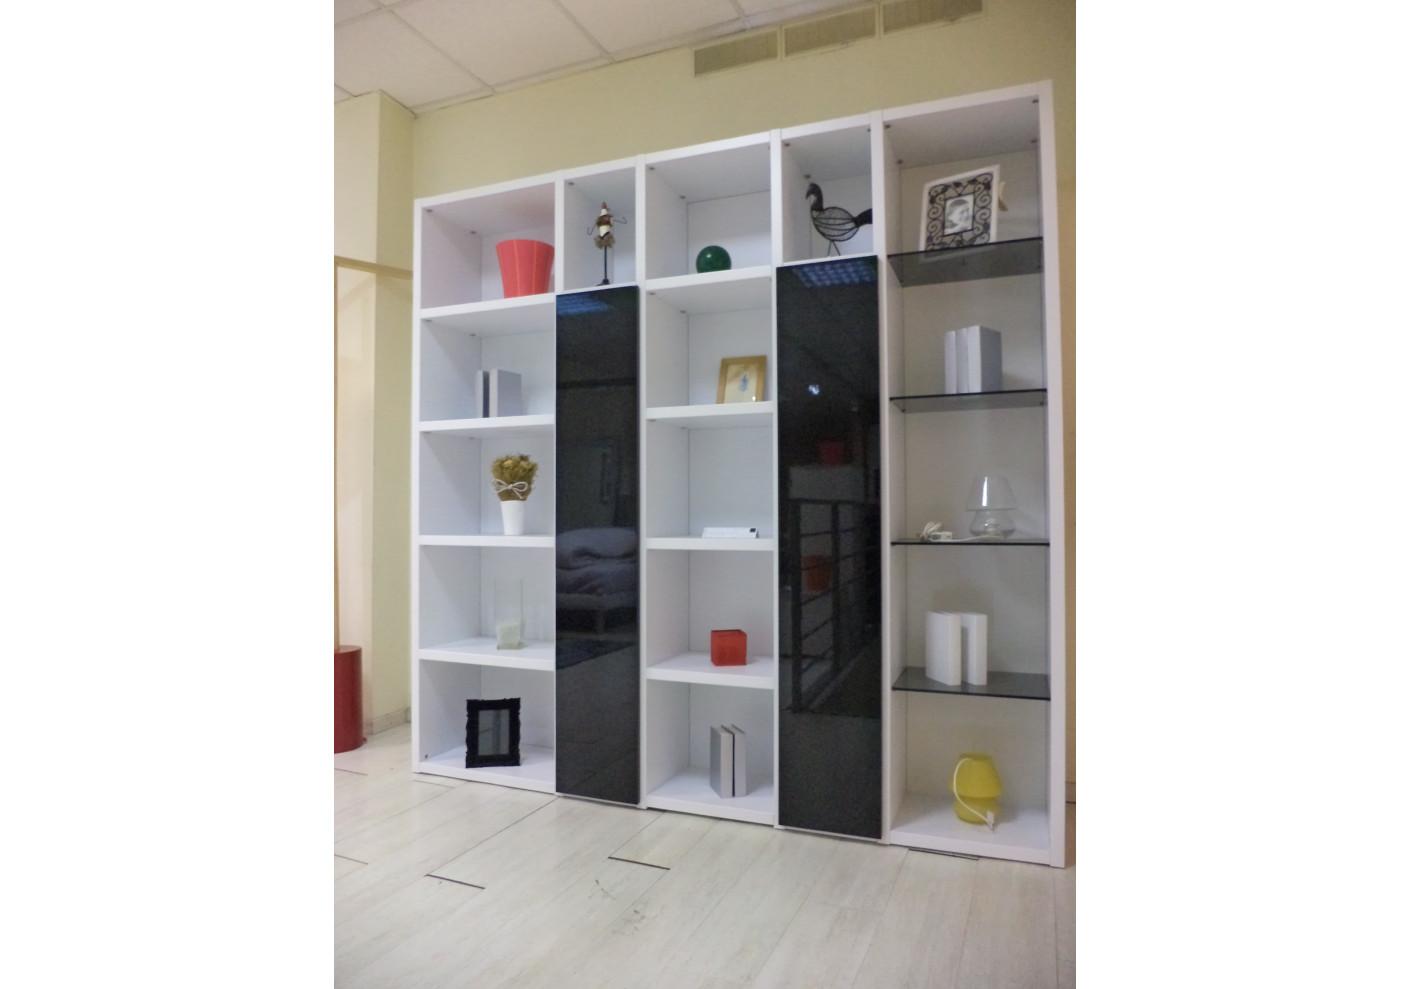 biblioth que reverso laqu e blanc portes noires. Black Bedroom Furniture Sets. Home Design Ideas